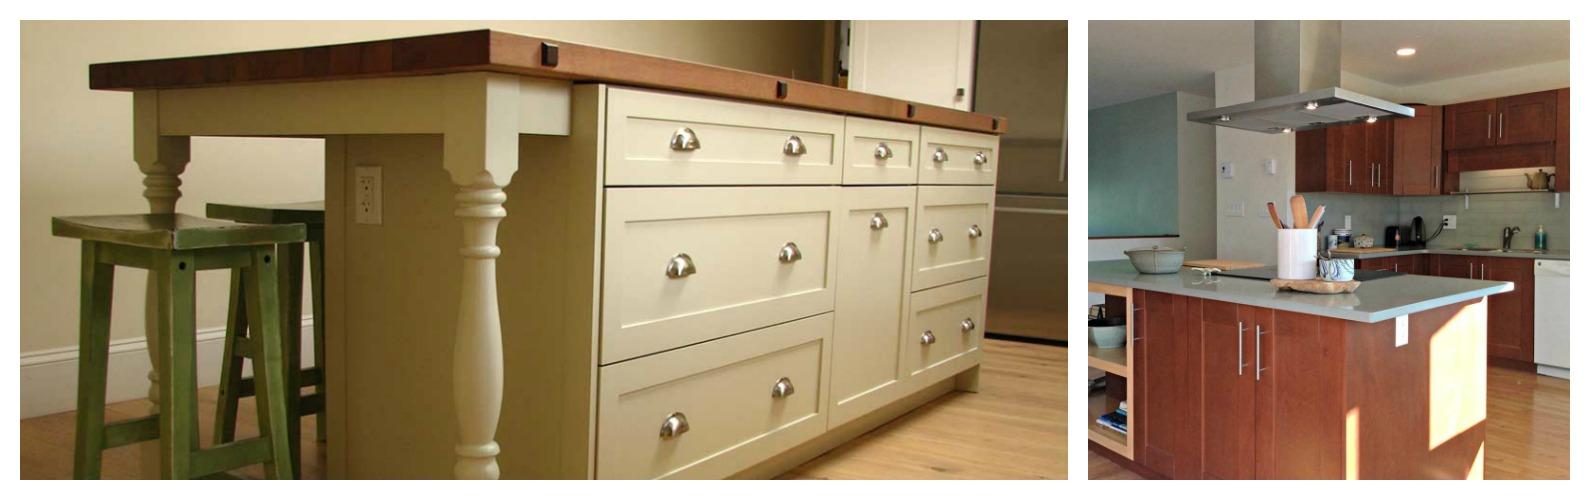 Custom Cabinetry Victoria